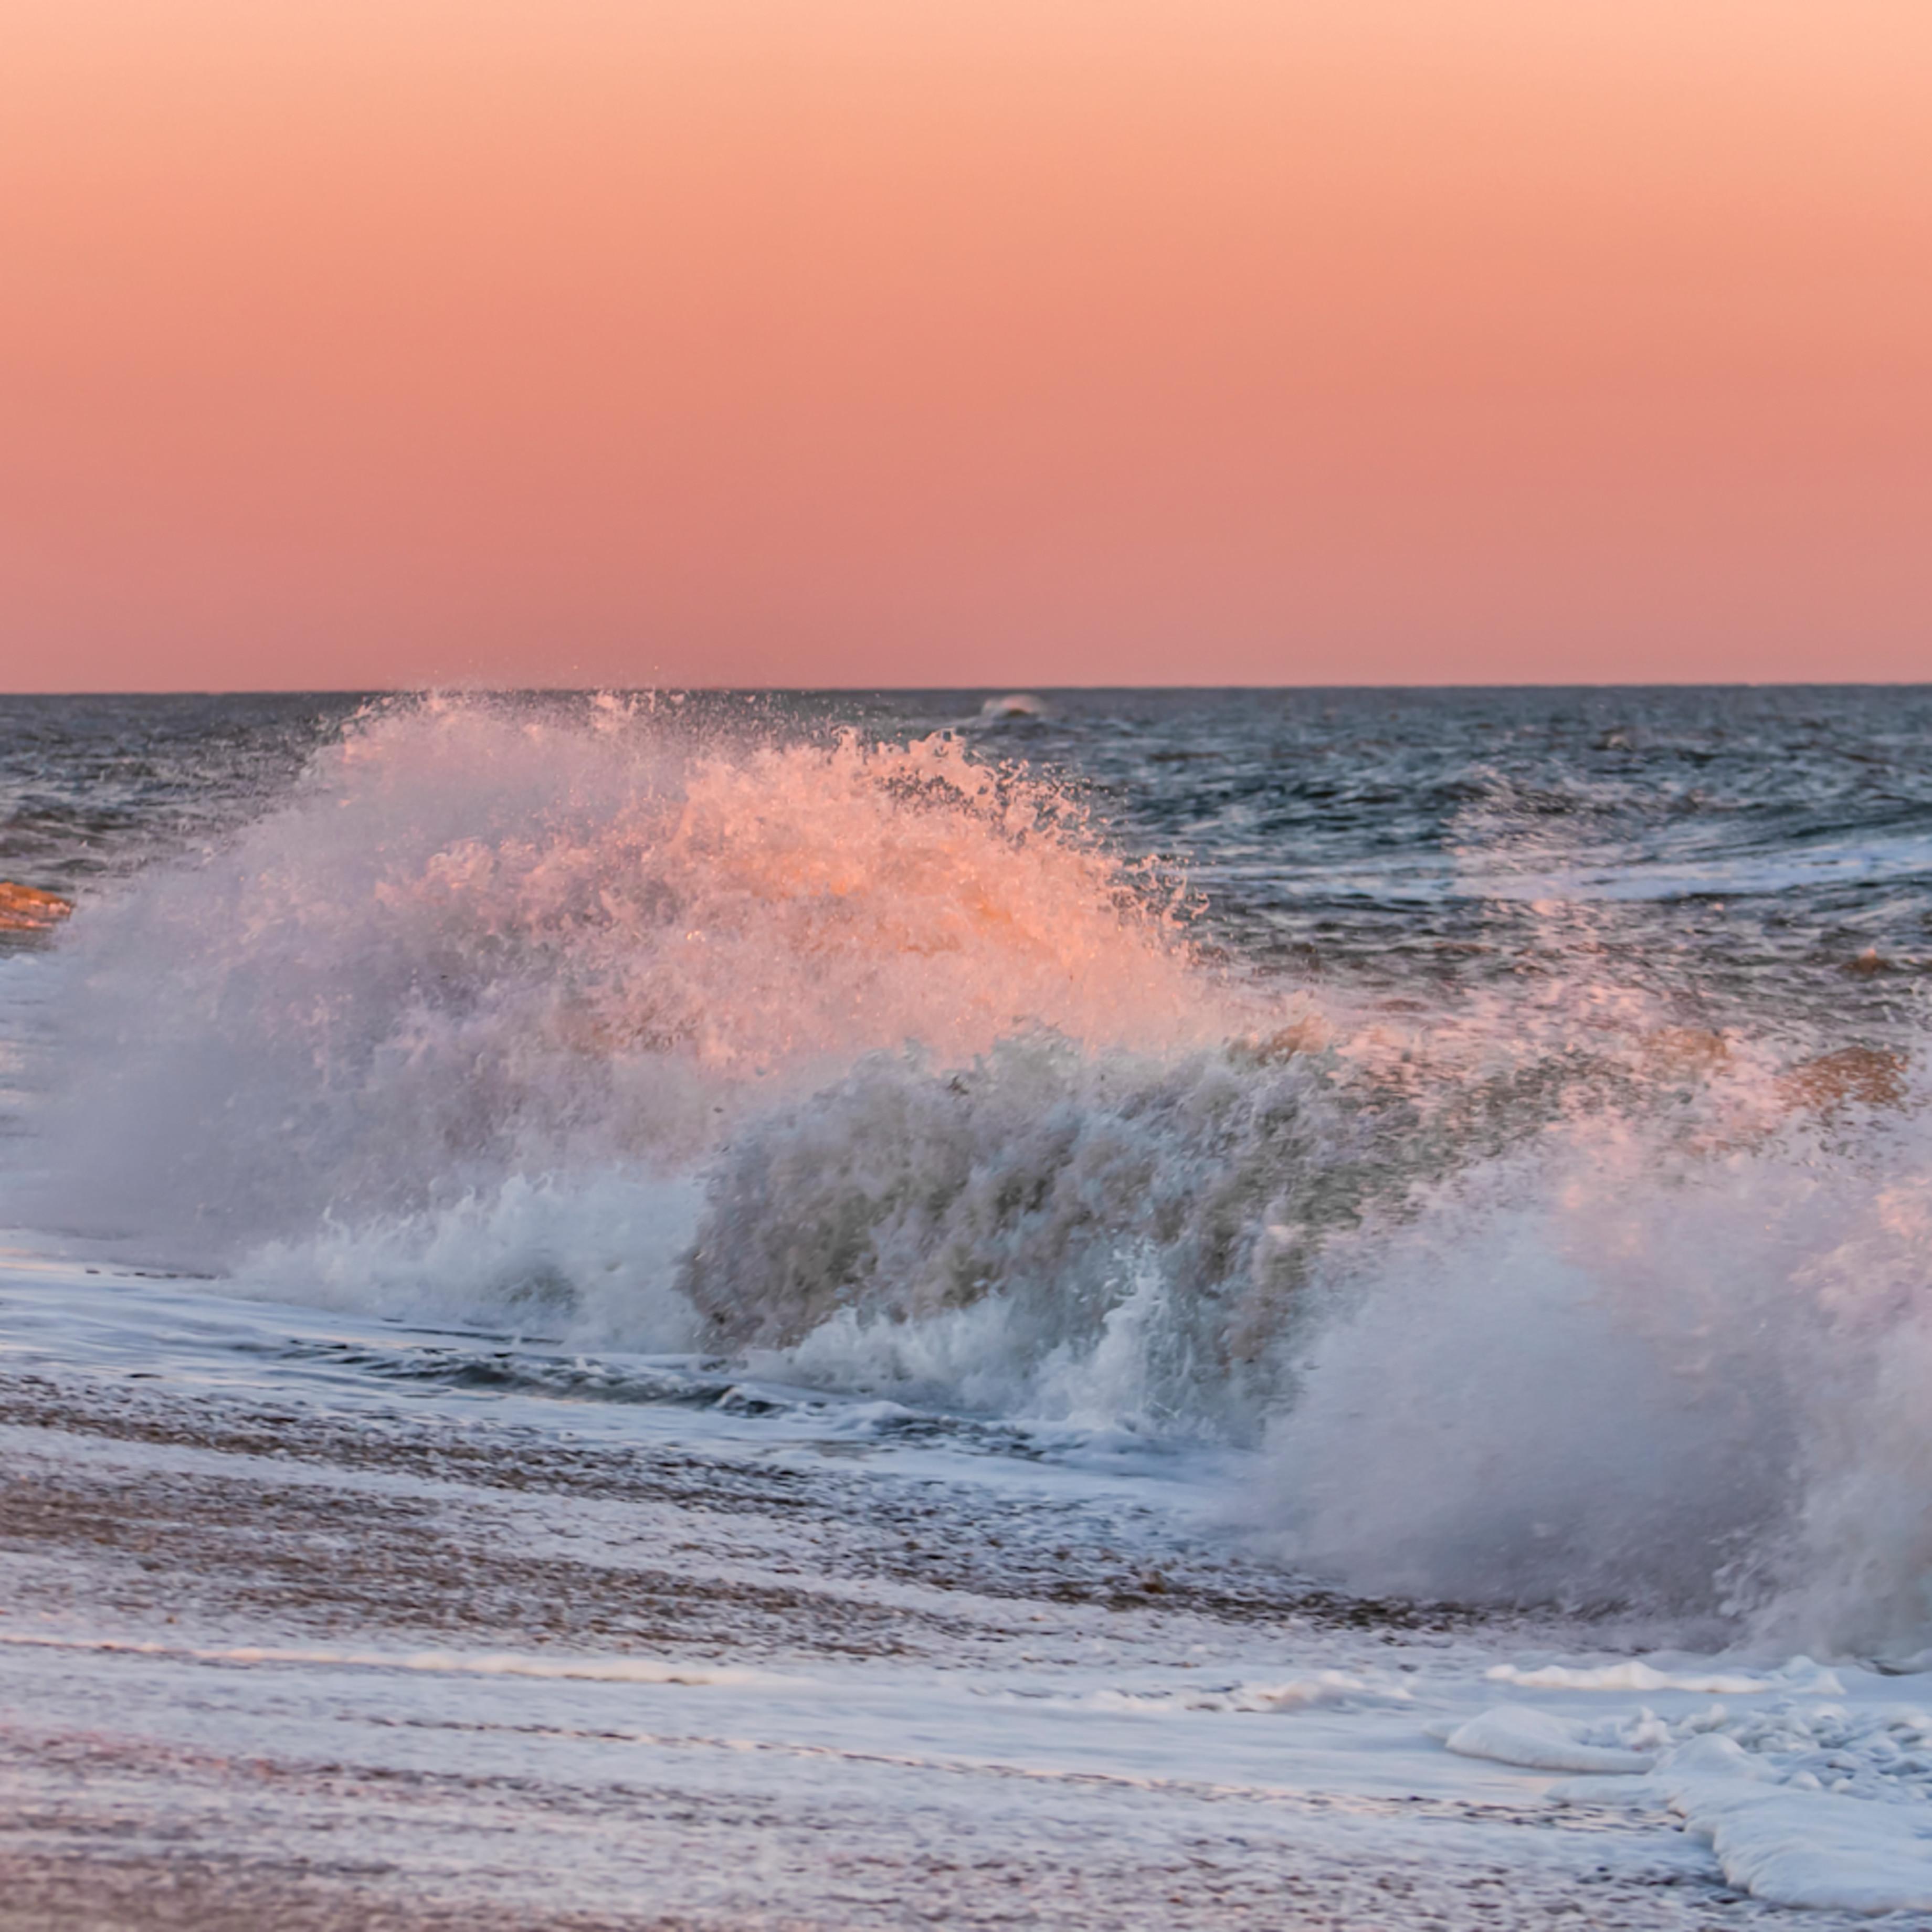 South beach winter crashing pink waves 1 bvnmcu